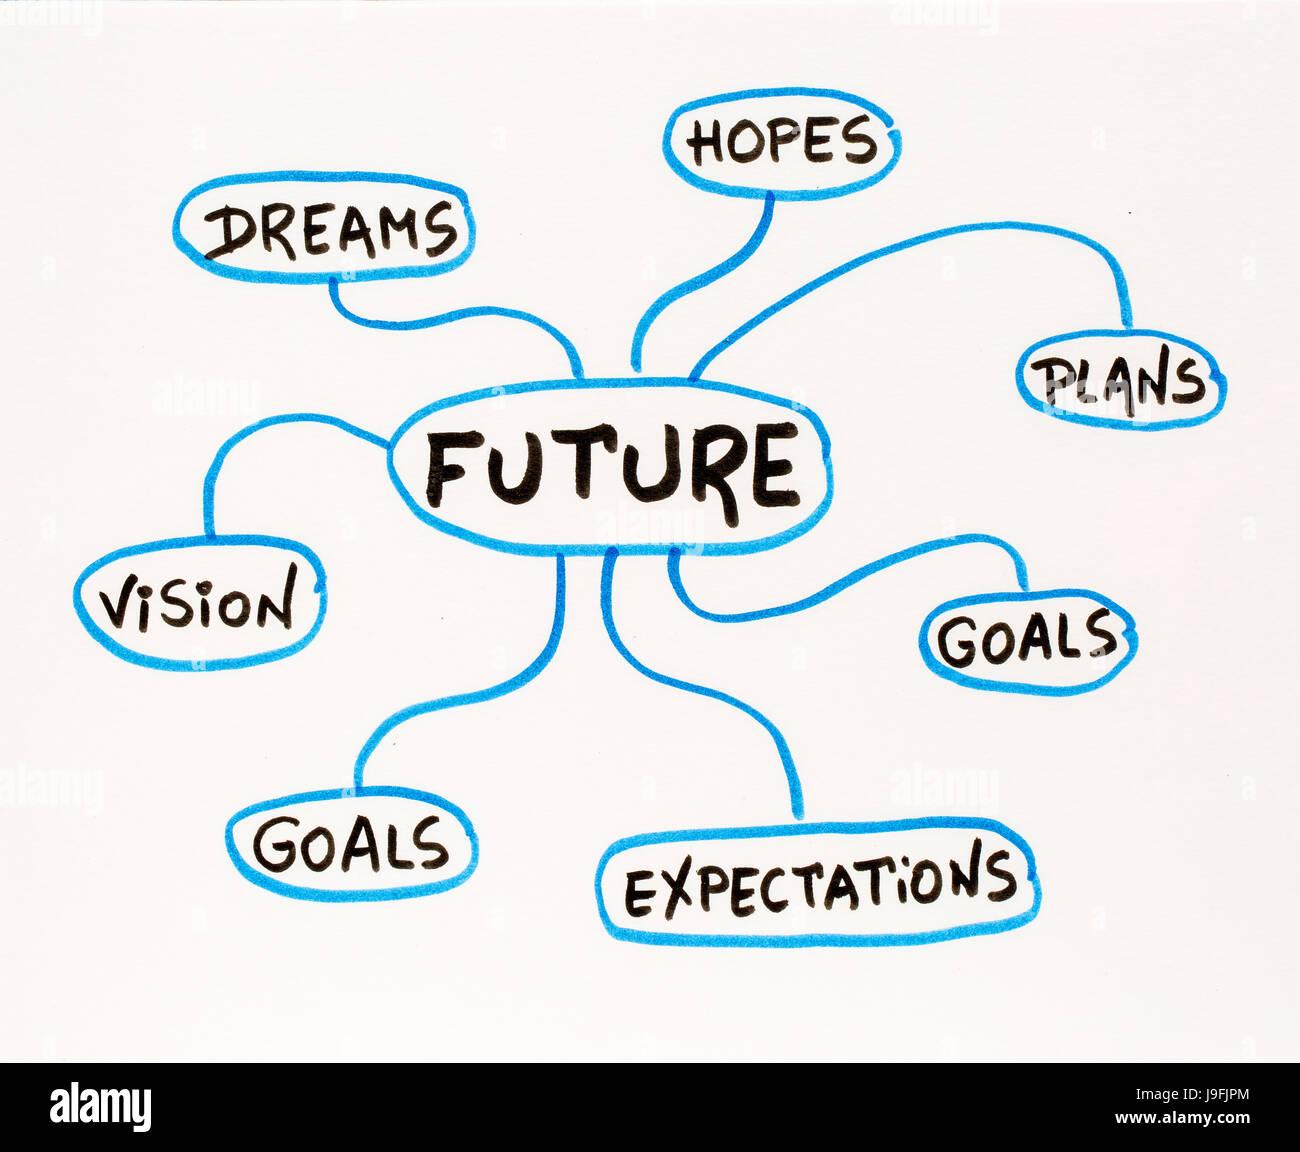 Dreams Plans Hopes Goals Vision